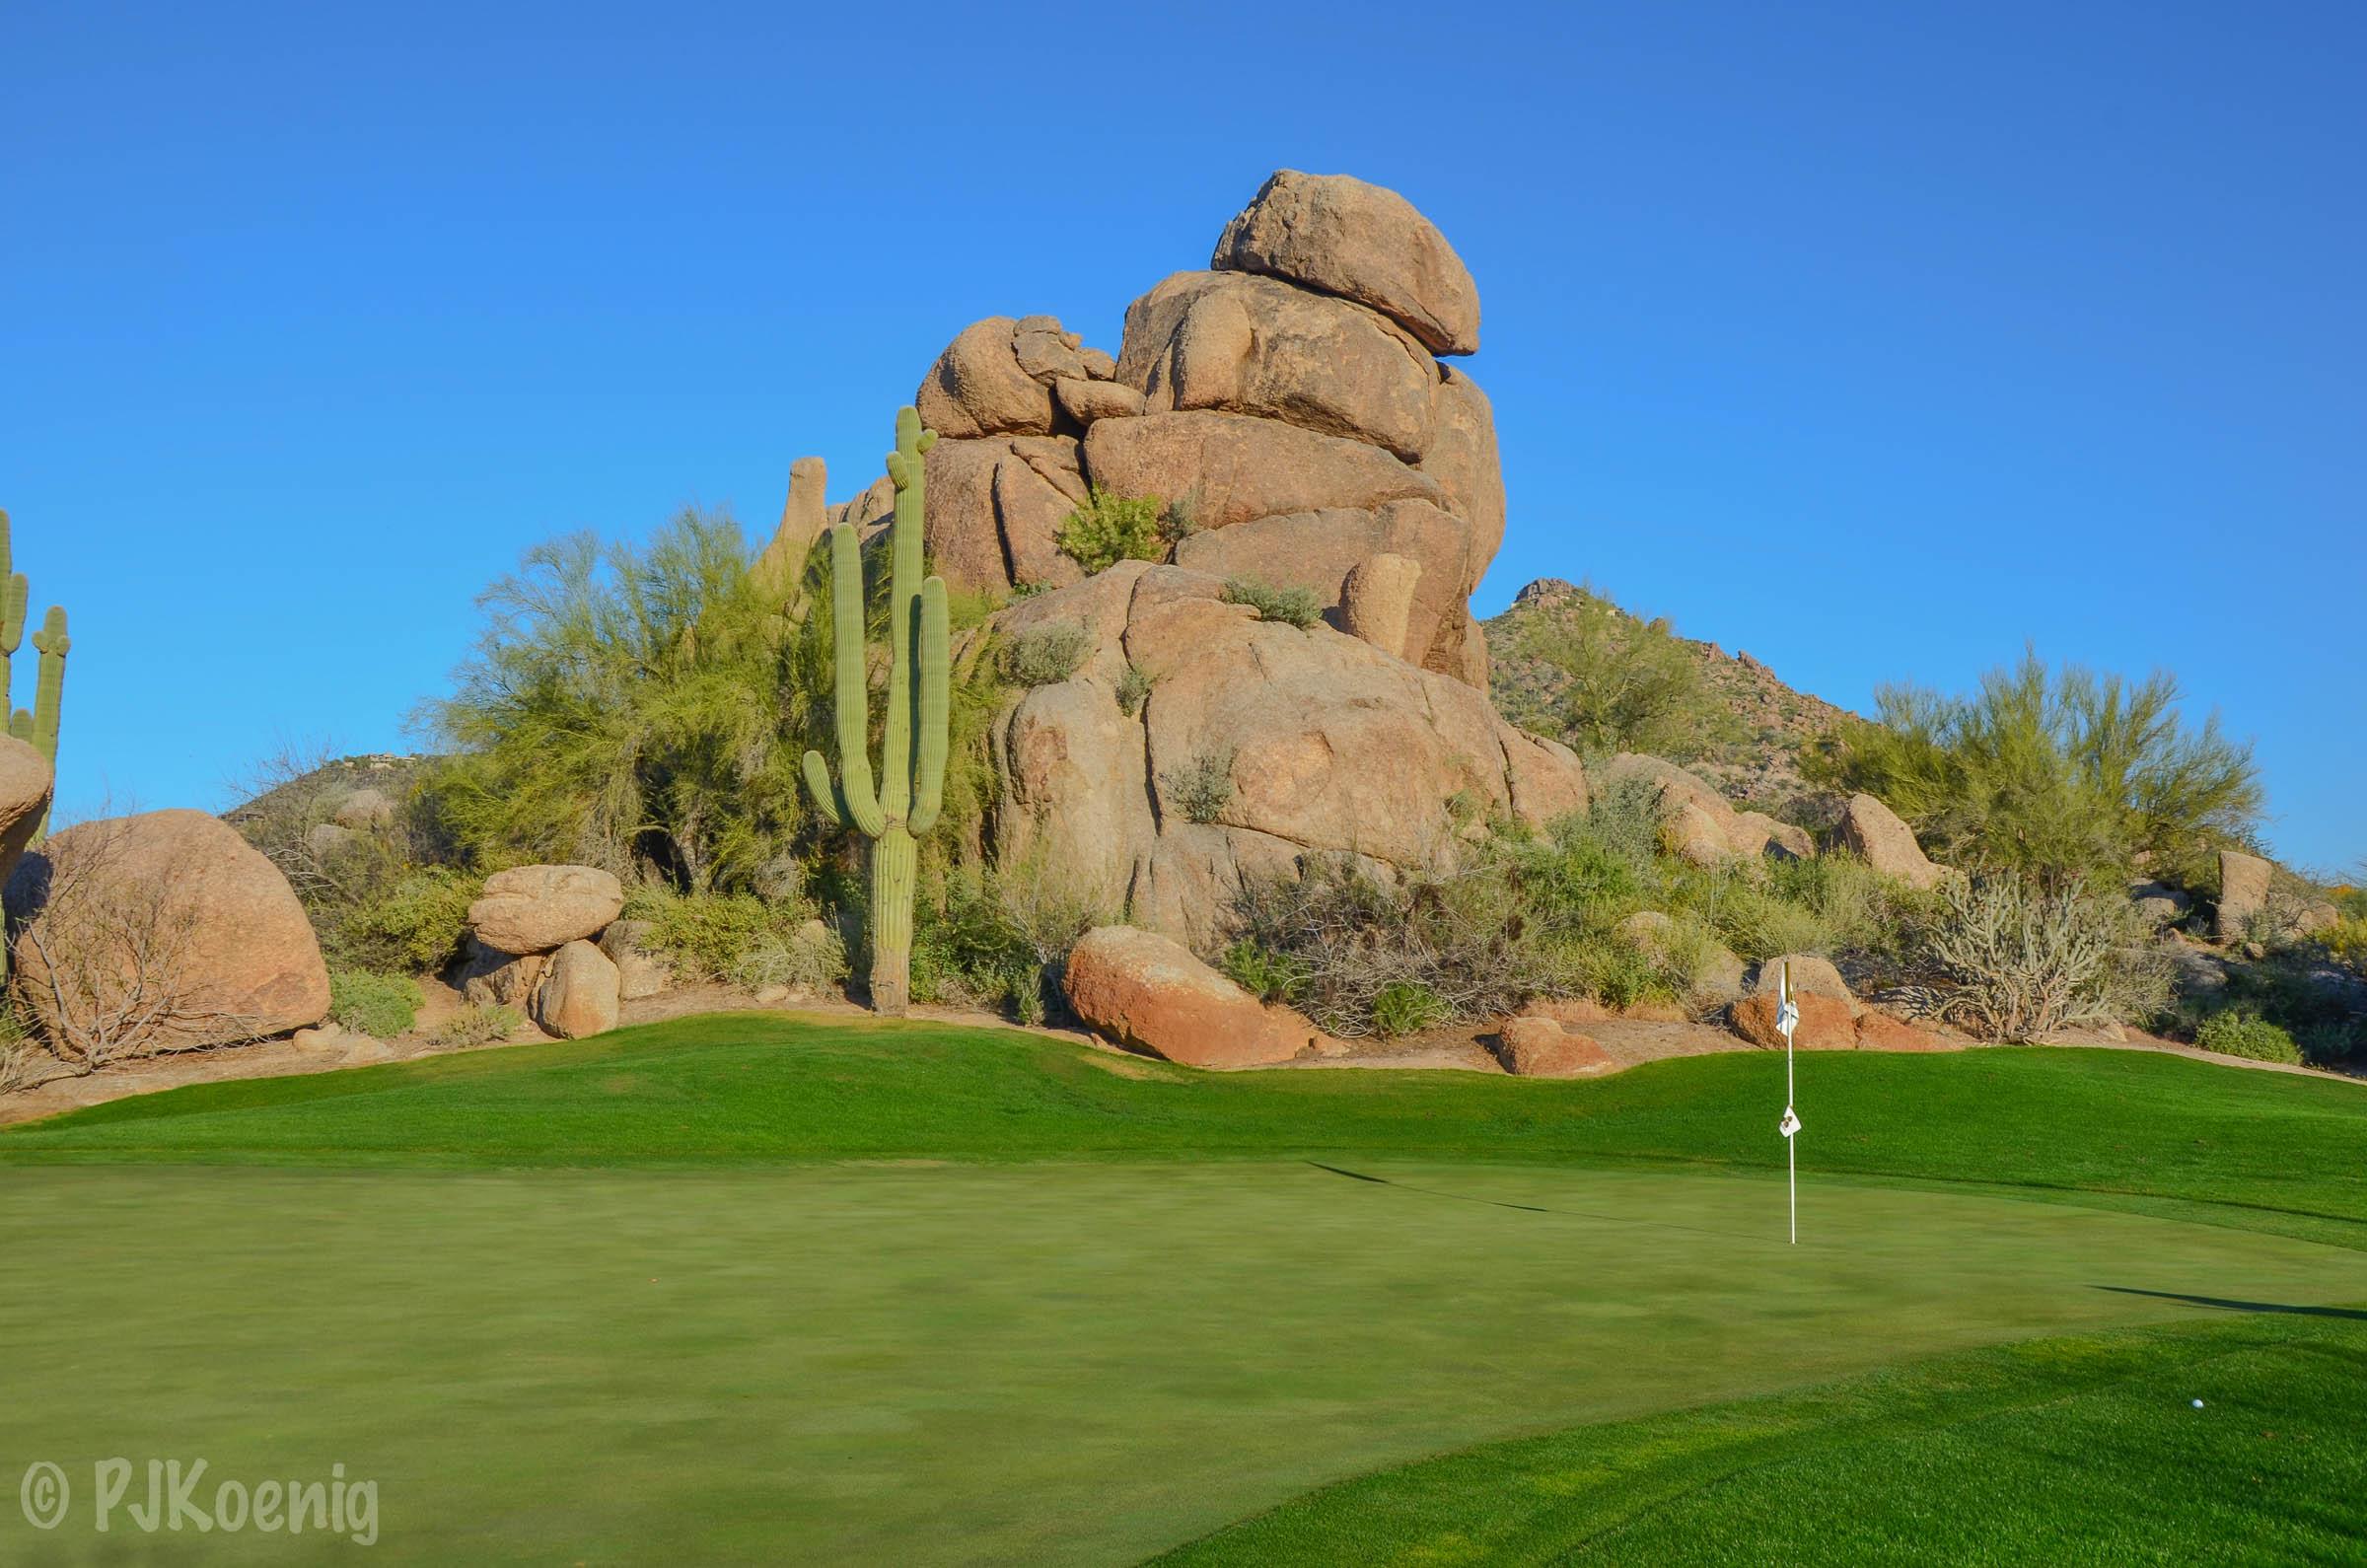 The Boulders - Carefree, AZ